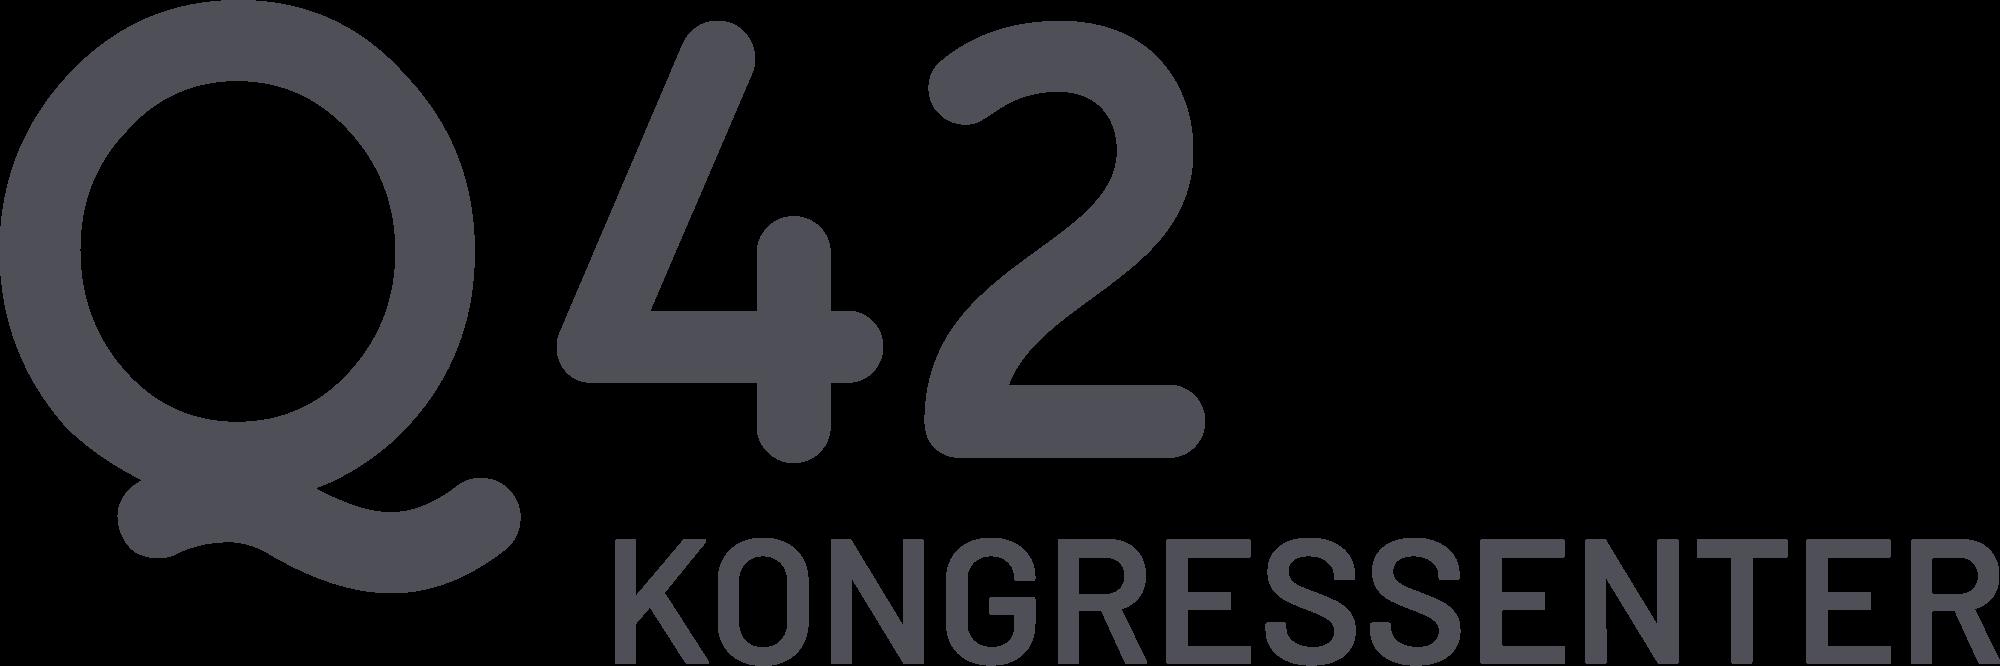 Q42 logo